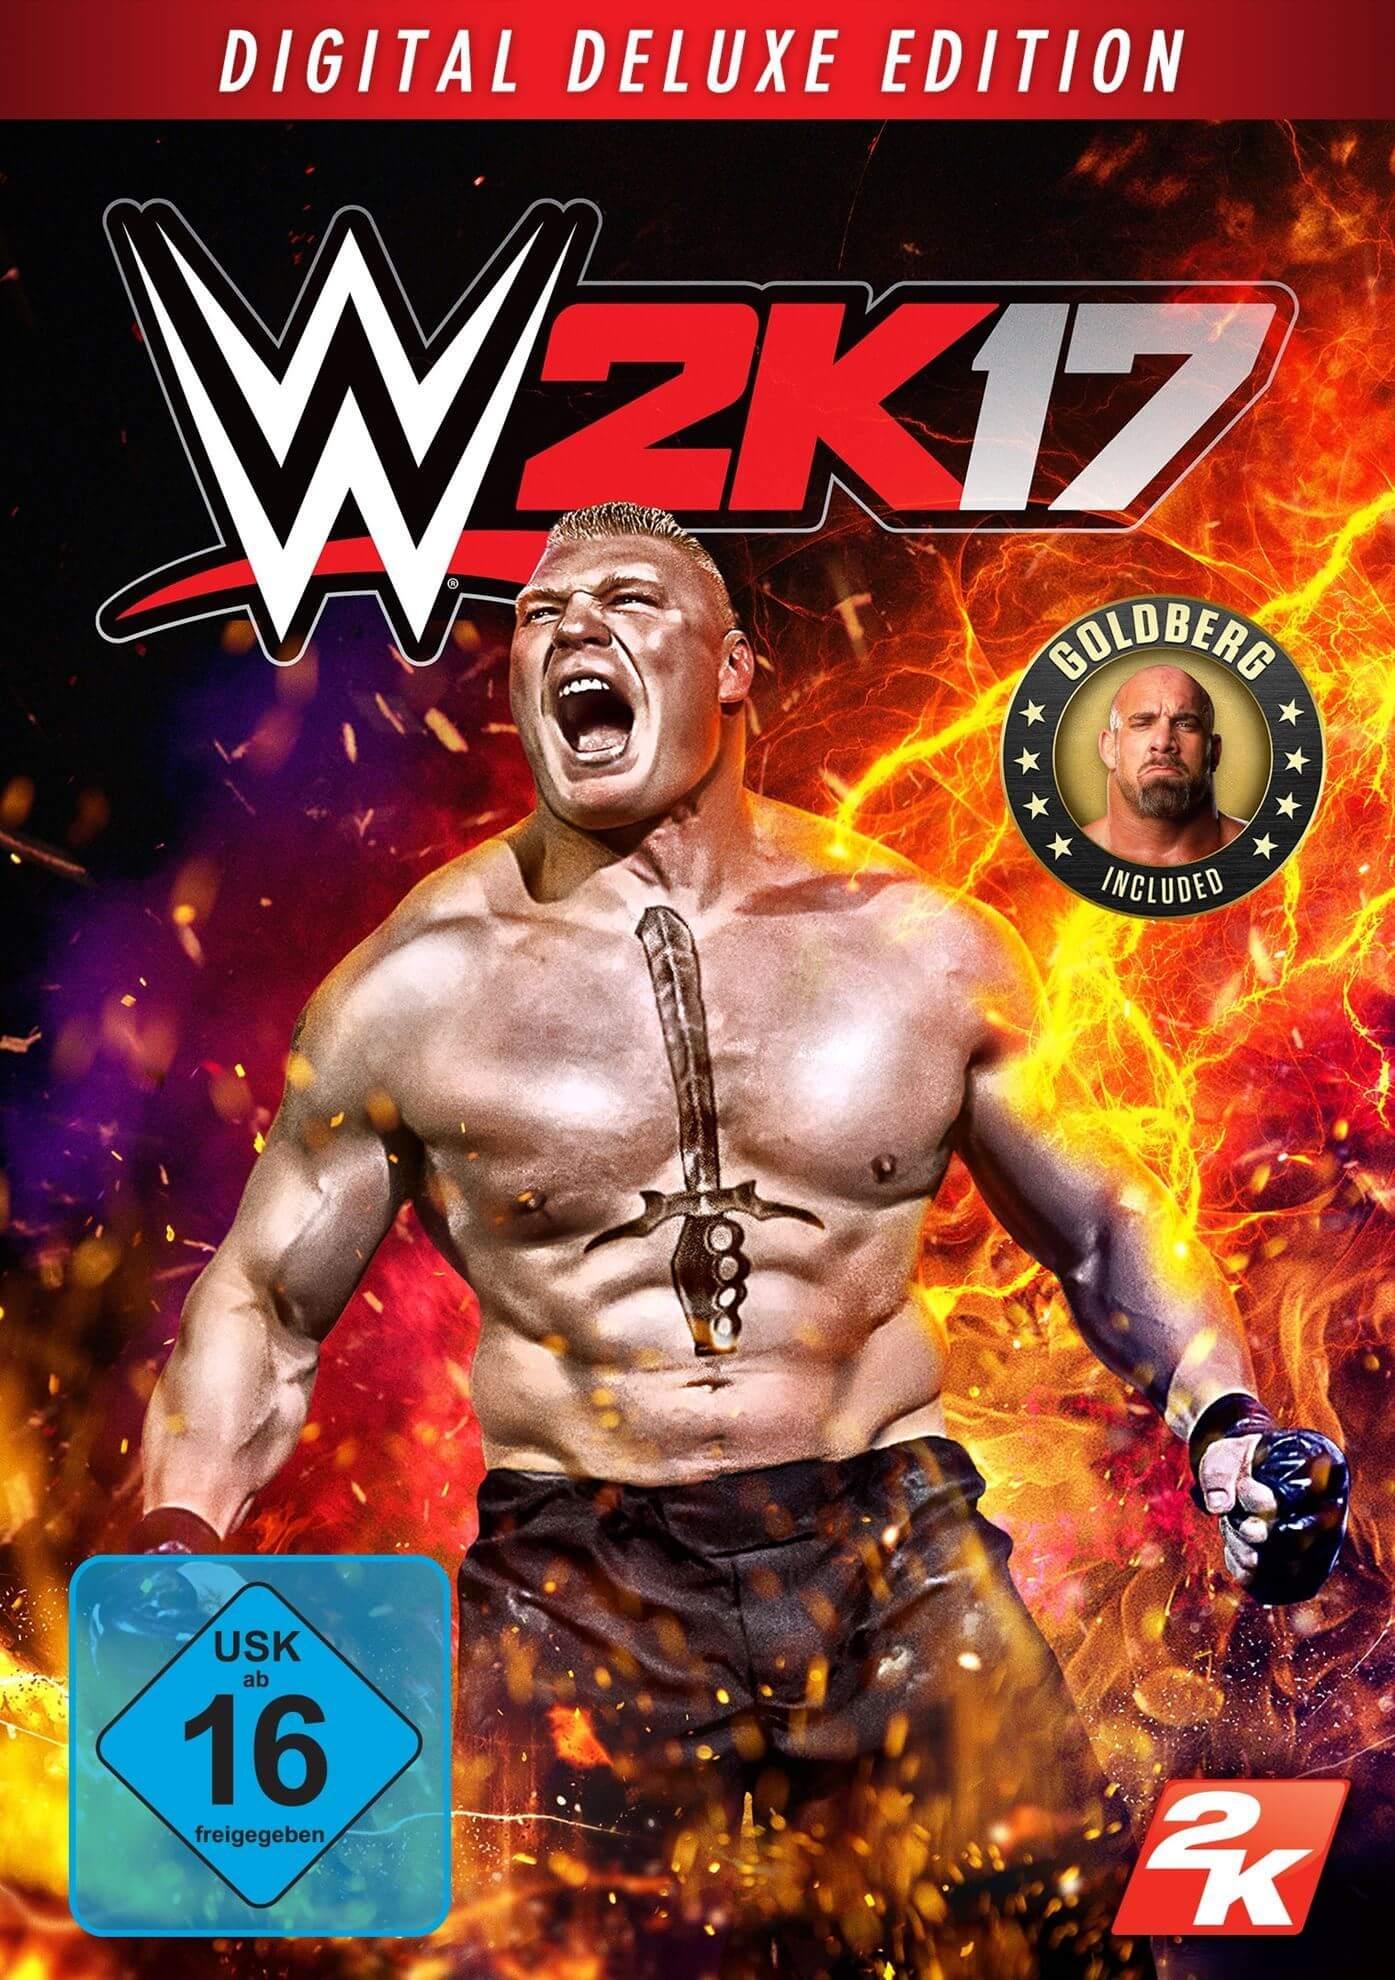 WWE 2K17 Digital Deluxe (ROW)